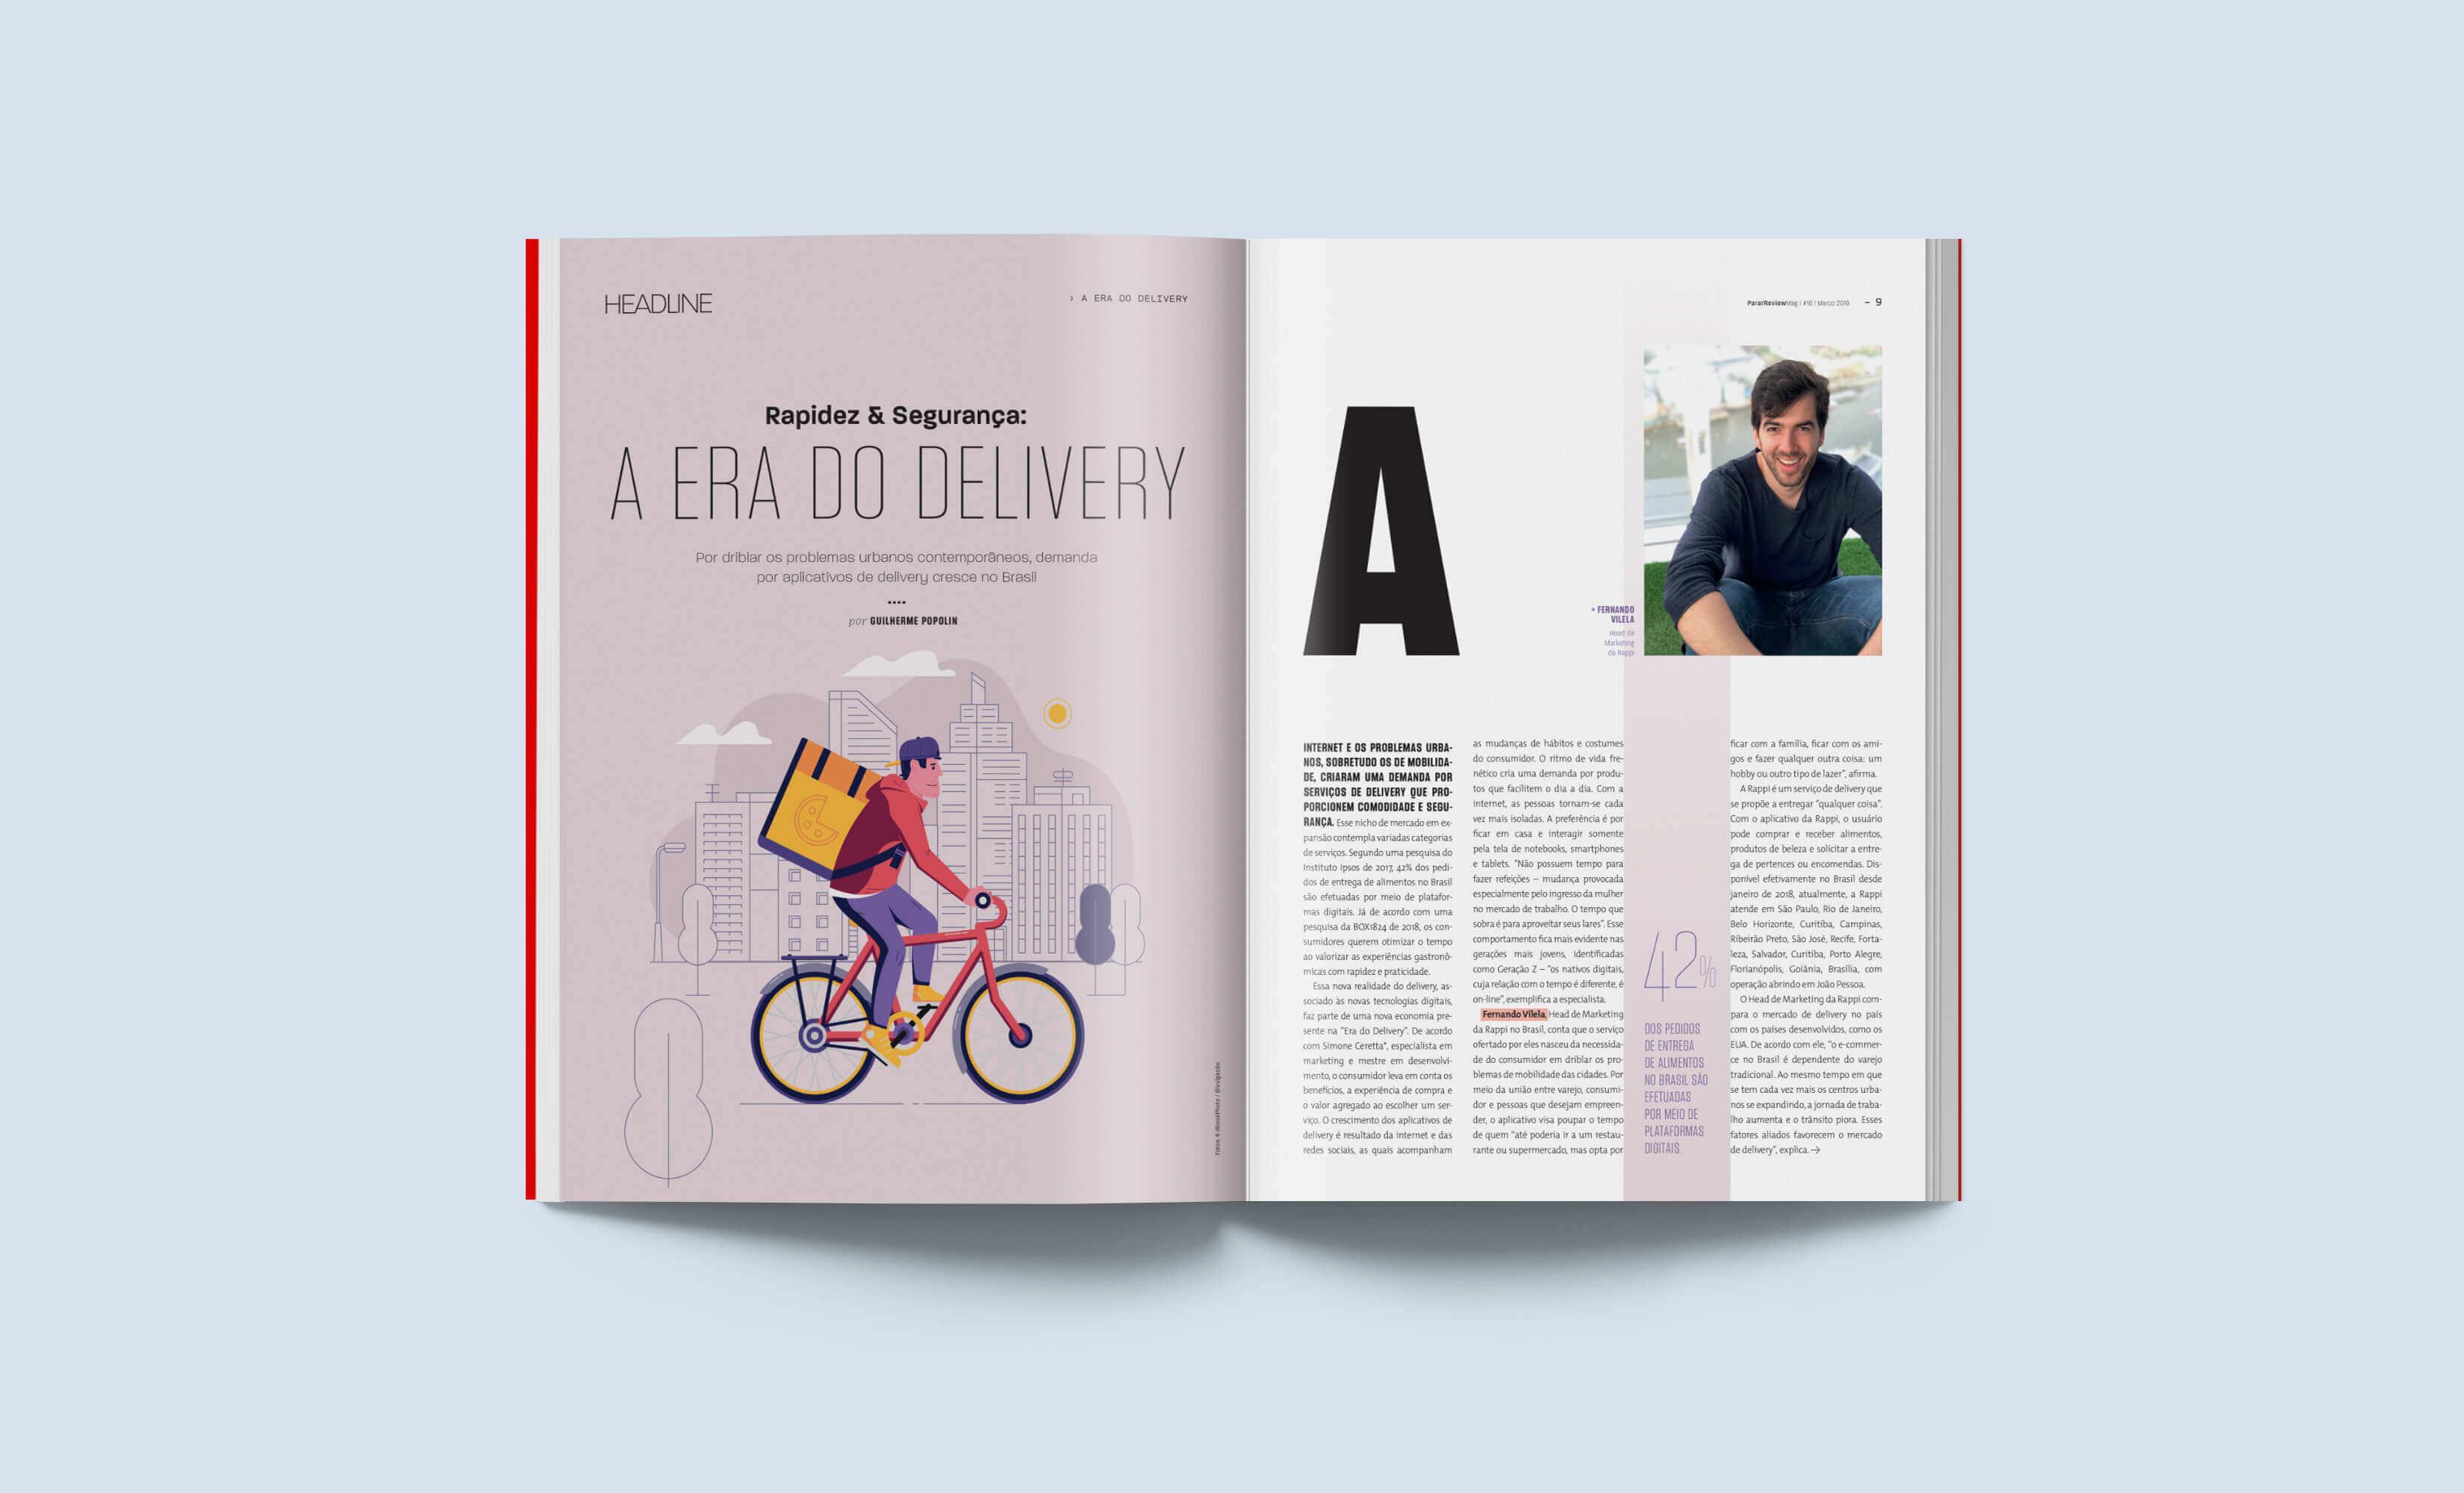 parar-magazine-delivery